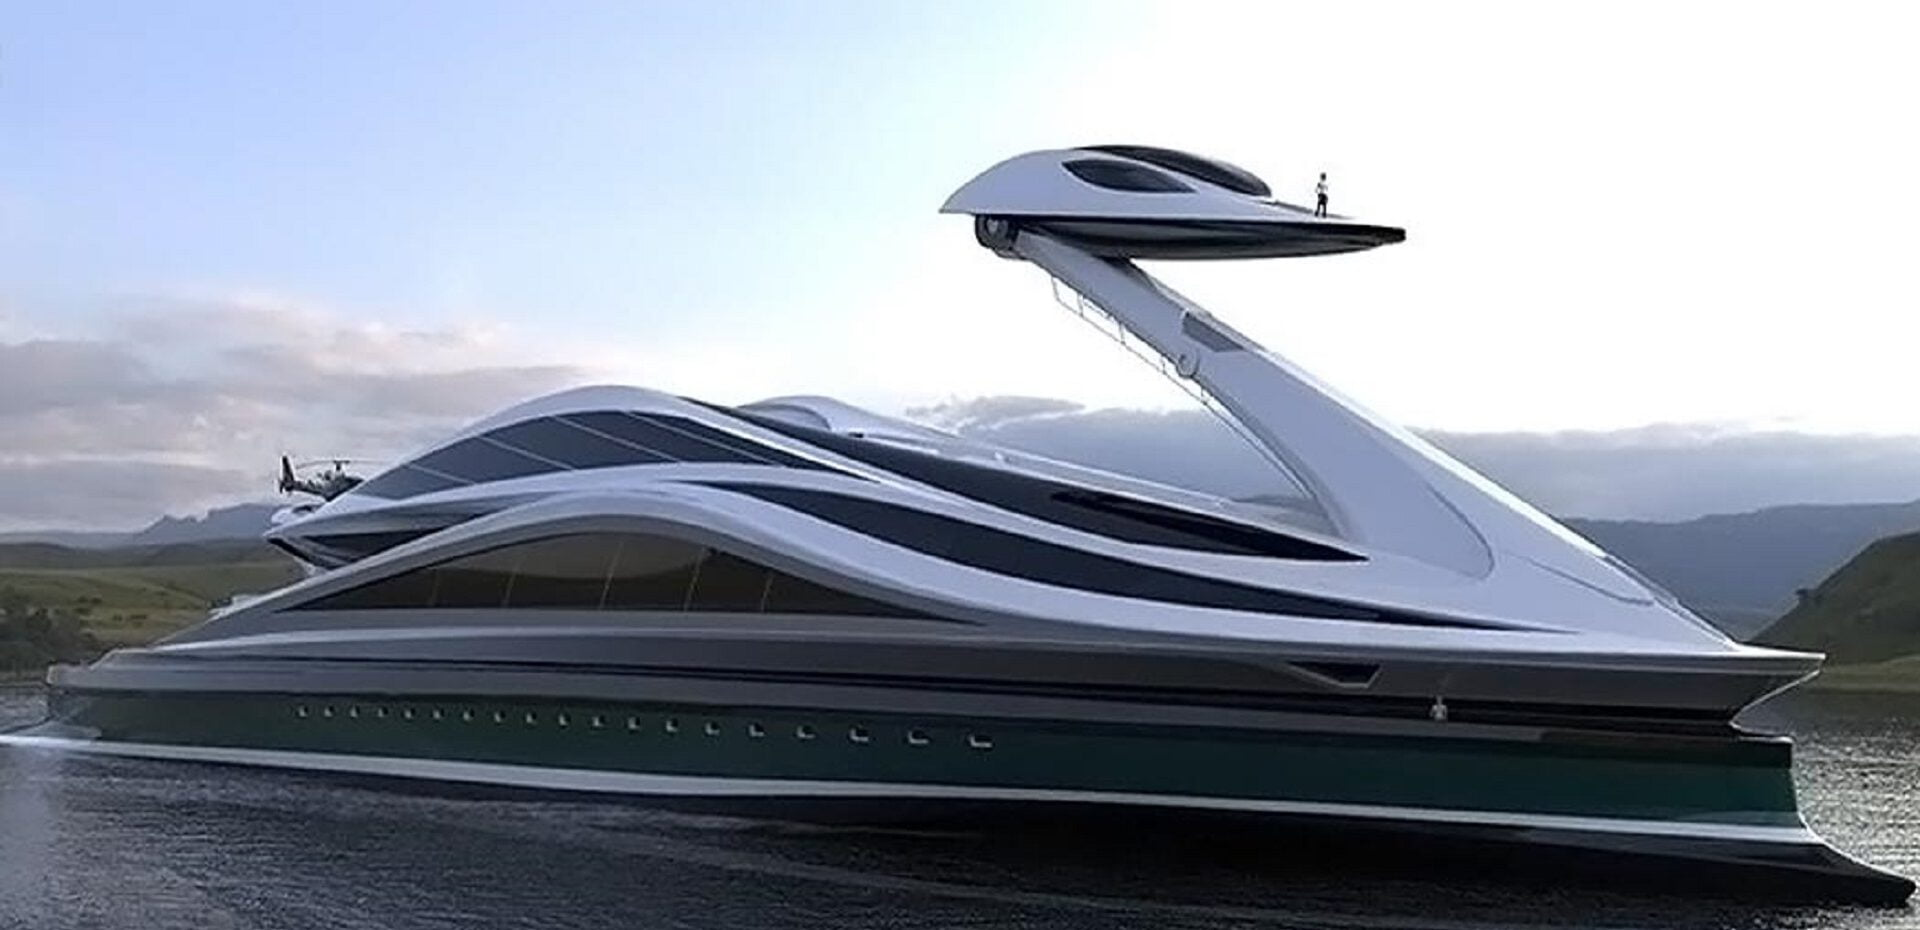 قایق تفریحی مفهومی پایدار